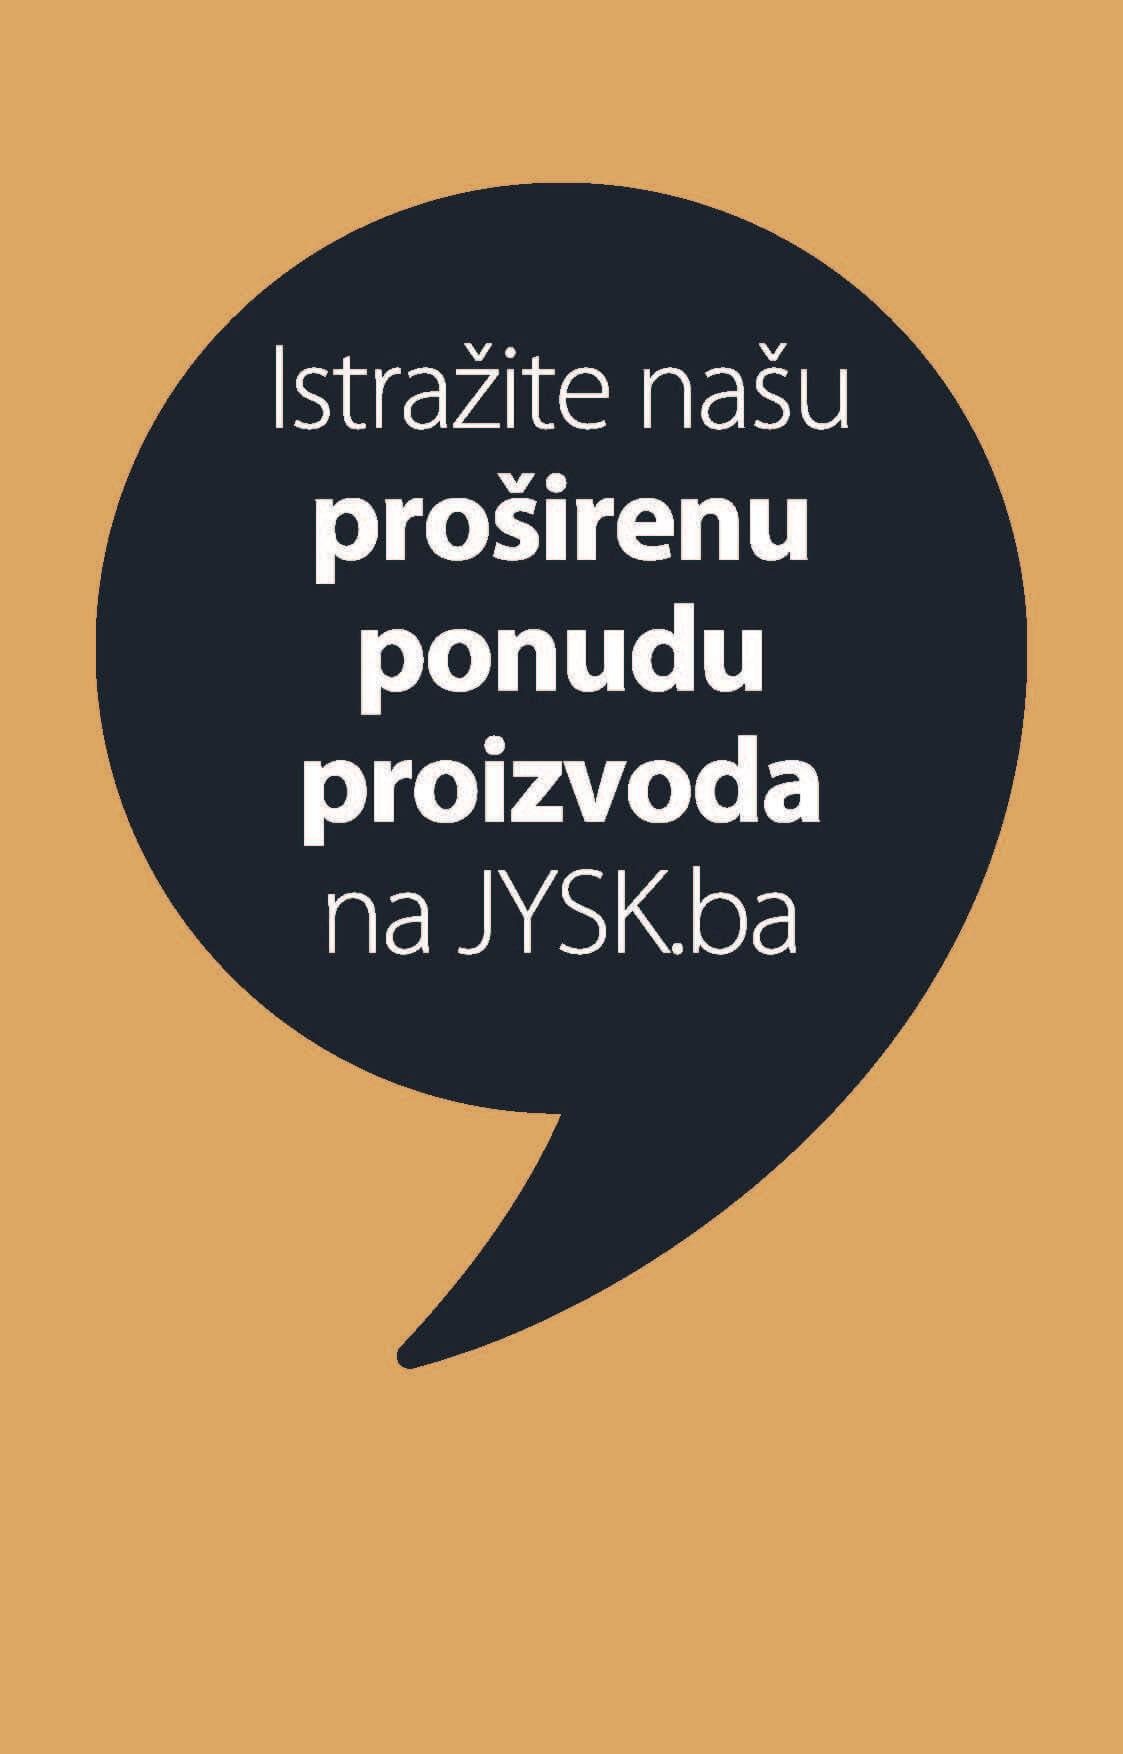 JYSK Katalog Akcijska ponuda MAJ 13.05.2021. 26.05.2021 ekatalozi.com Page 01 1